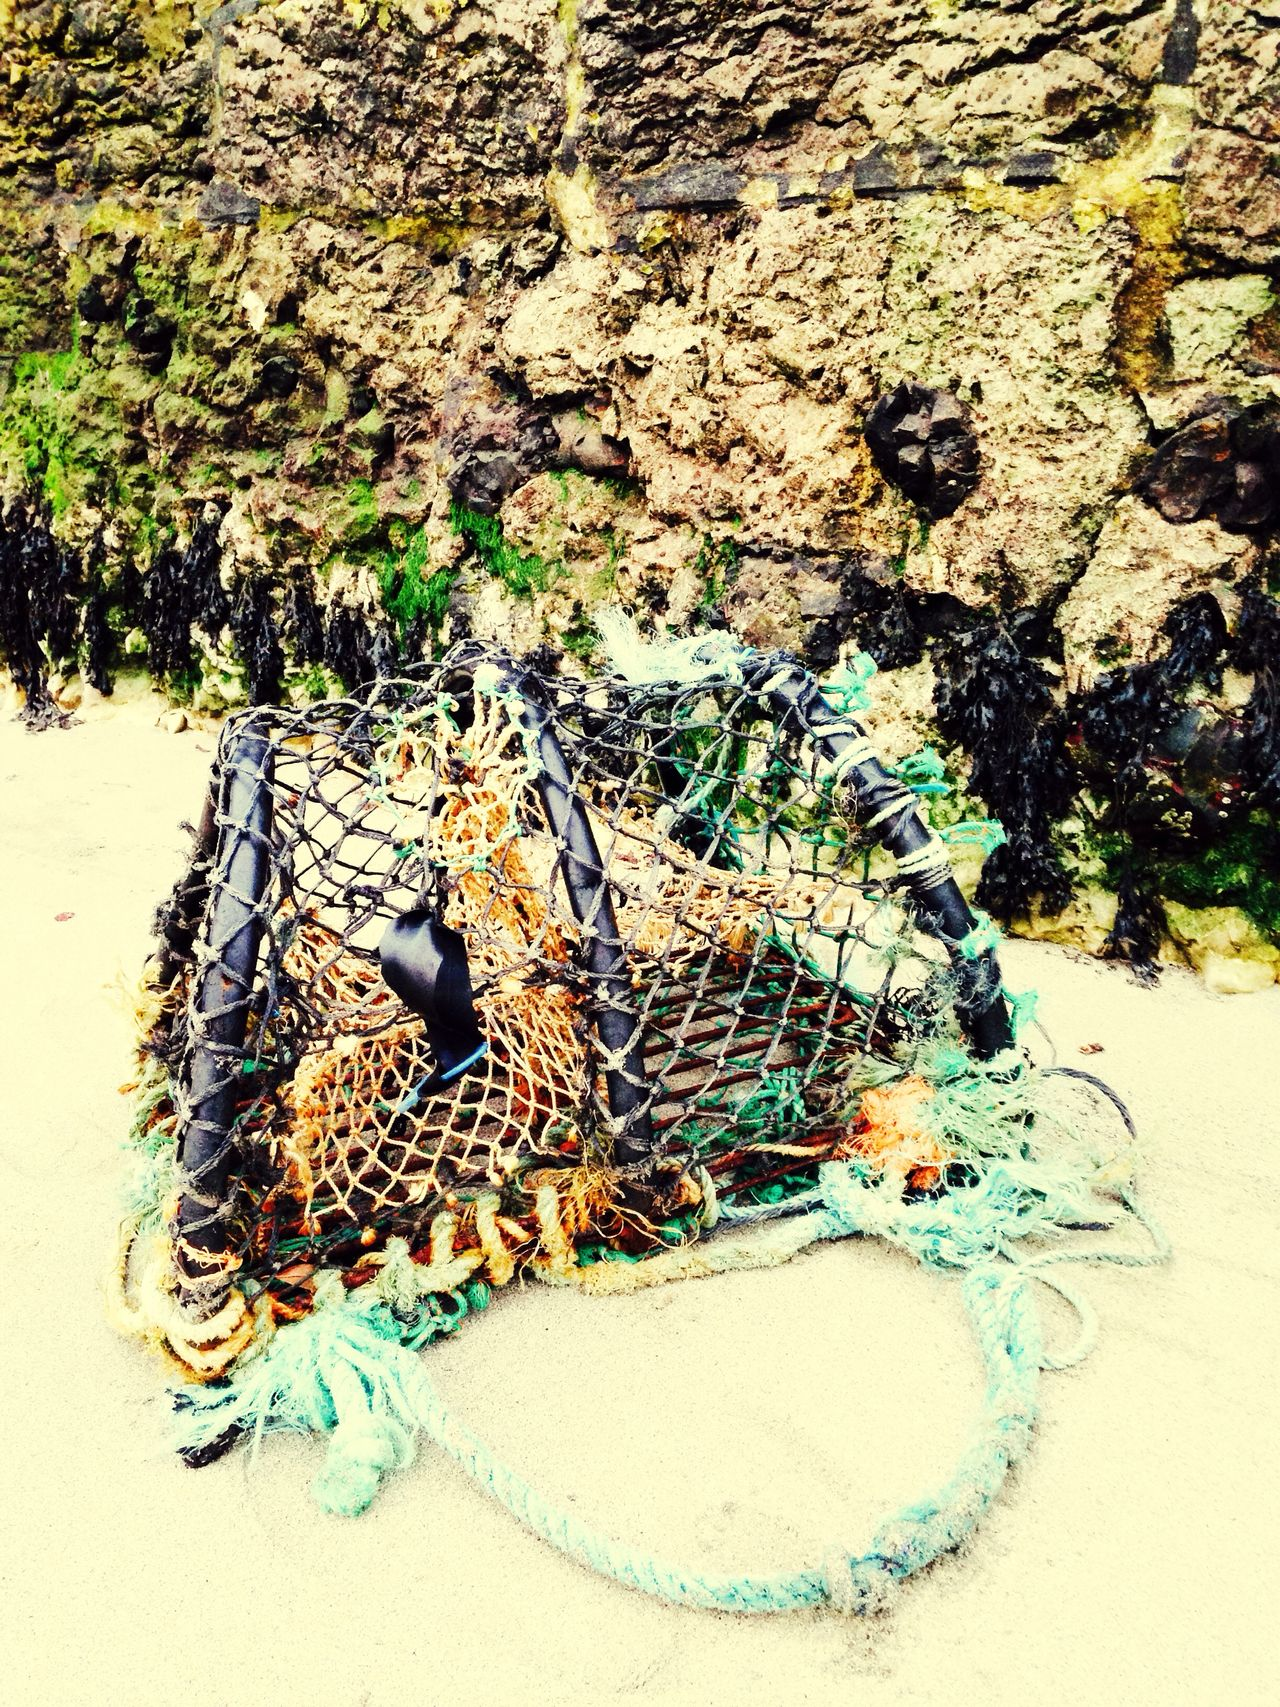 Lobster Pot Seaside Exploring Seaweed Harbour Wall Colour Splash Portmuck